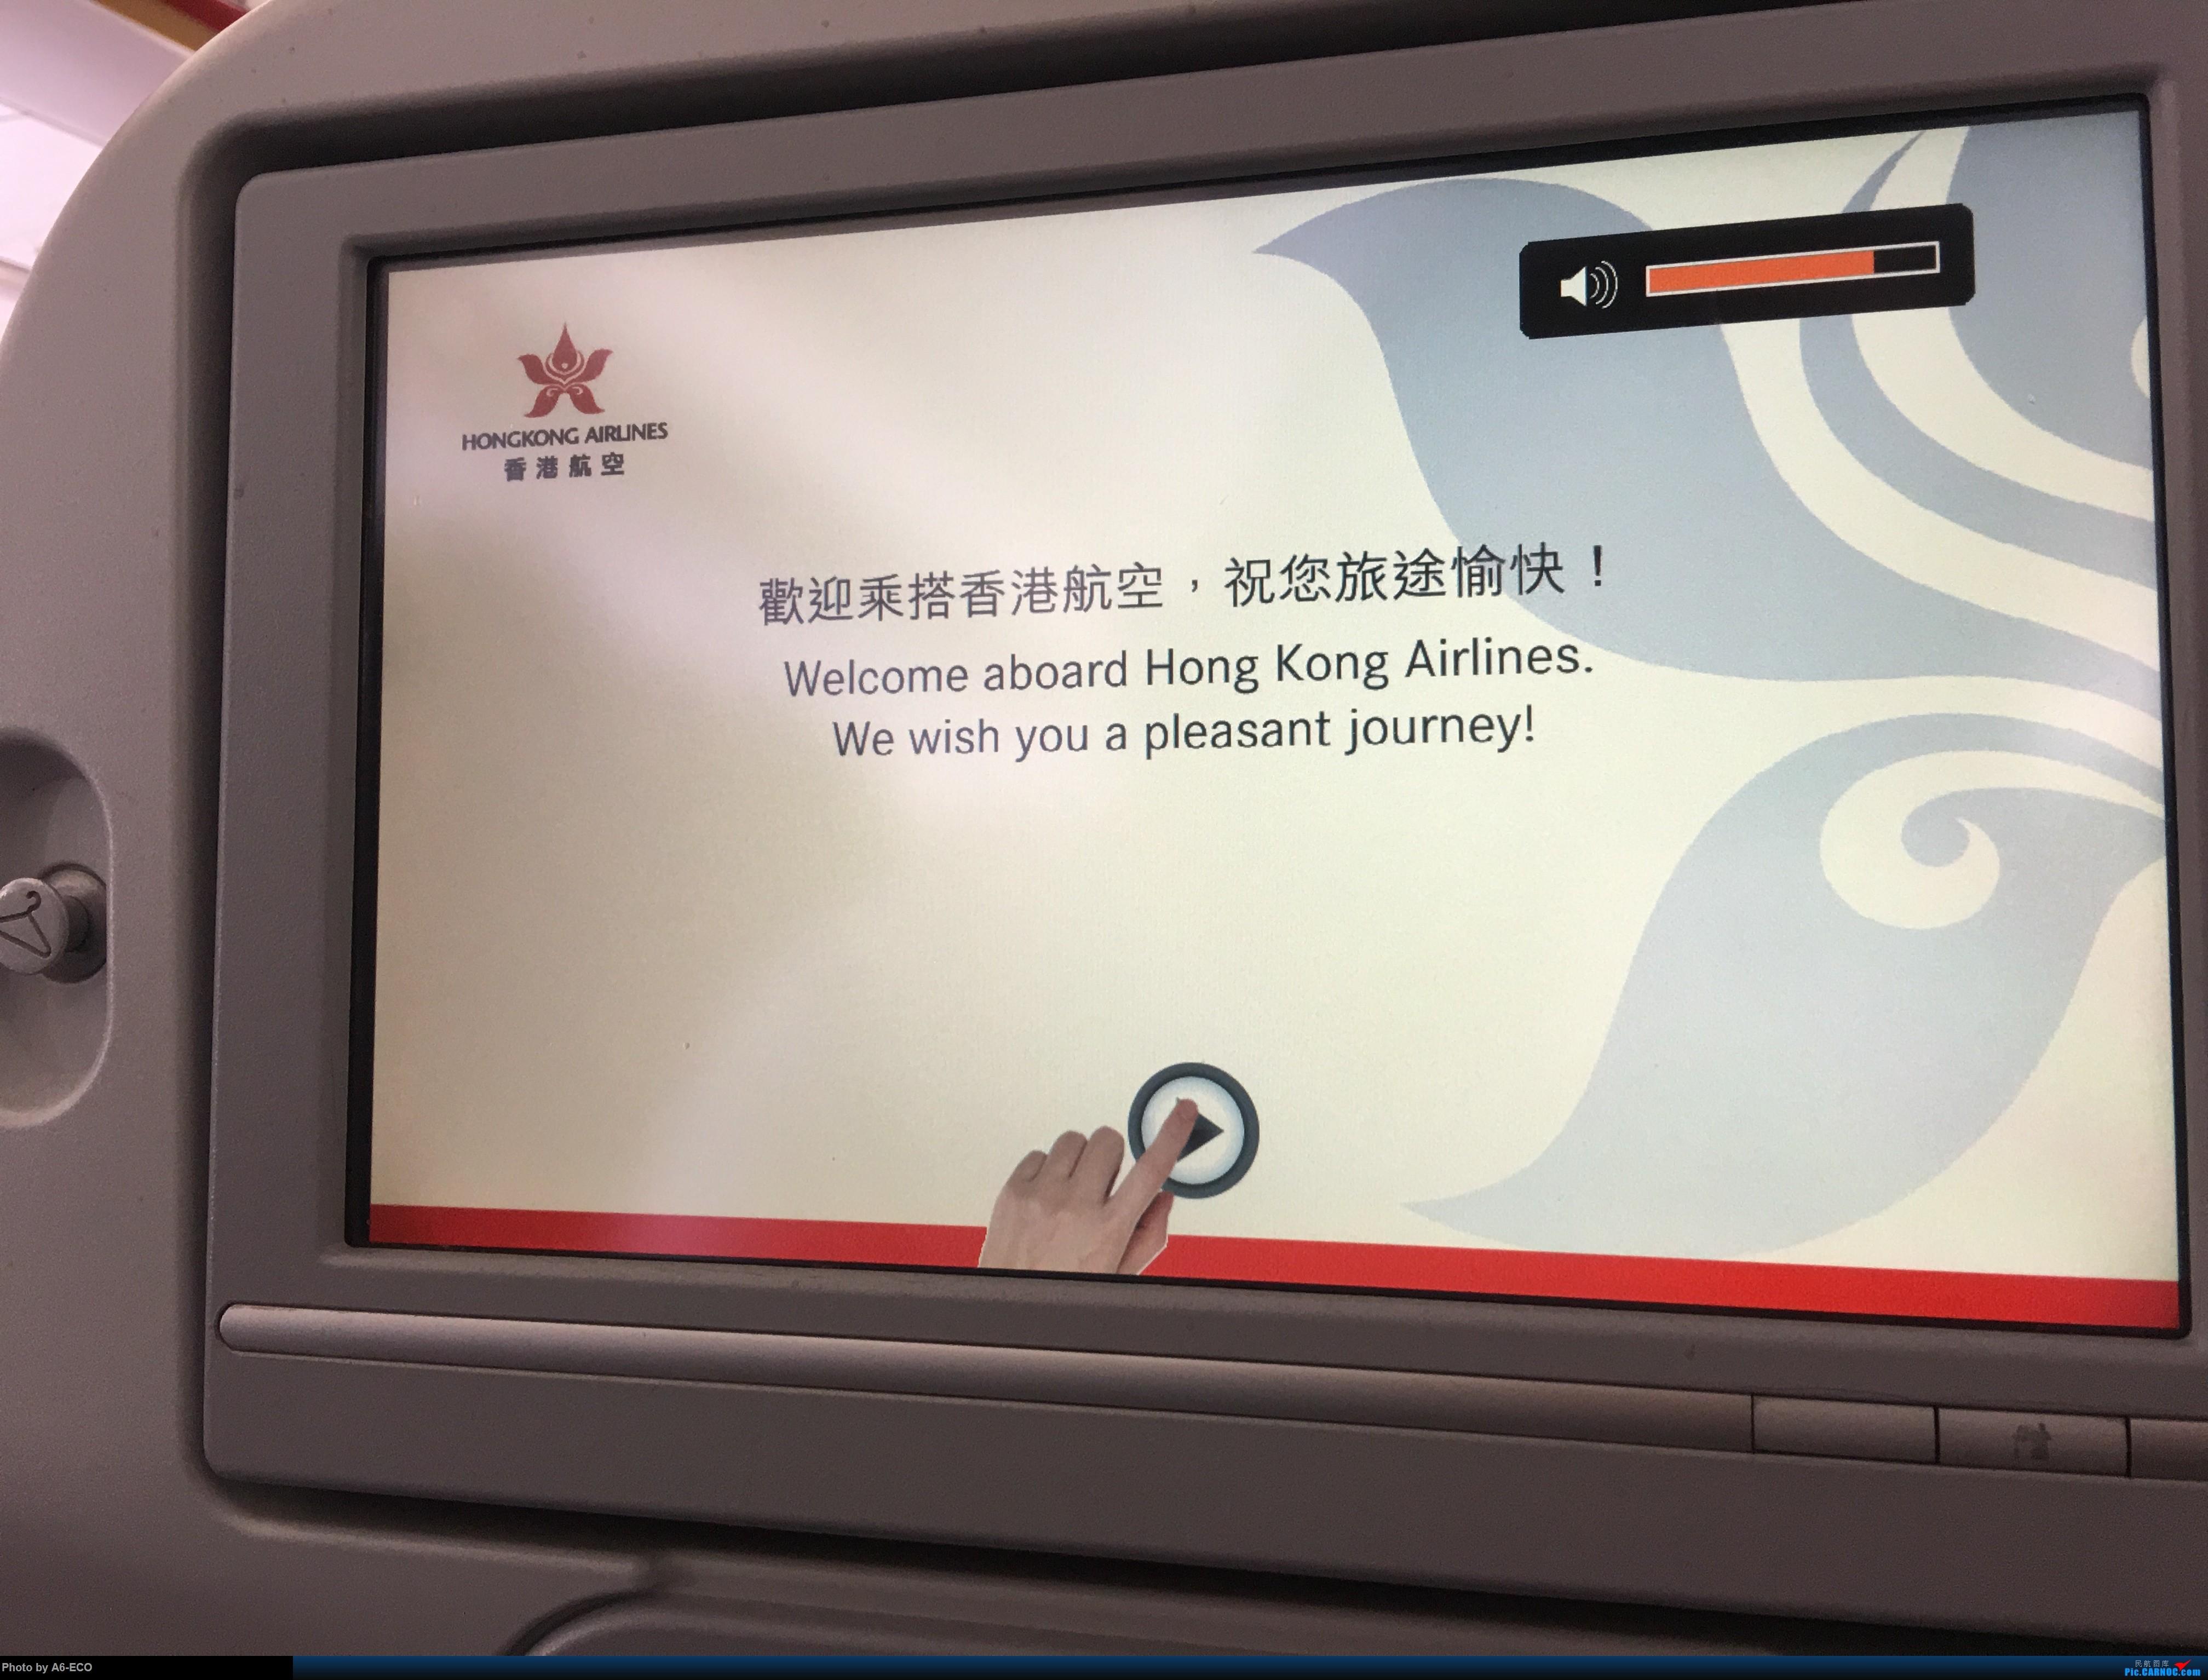 Re:[原创]海鲜航305航班+hxg拍机+香港推荐美食+回程海鲜航 AIRBUS A330-300 B-LNP 中国北京首都国际机场